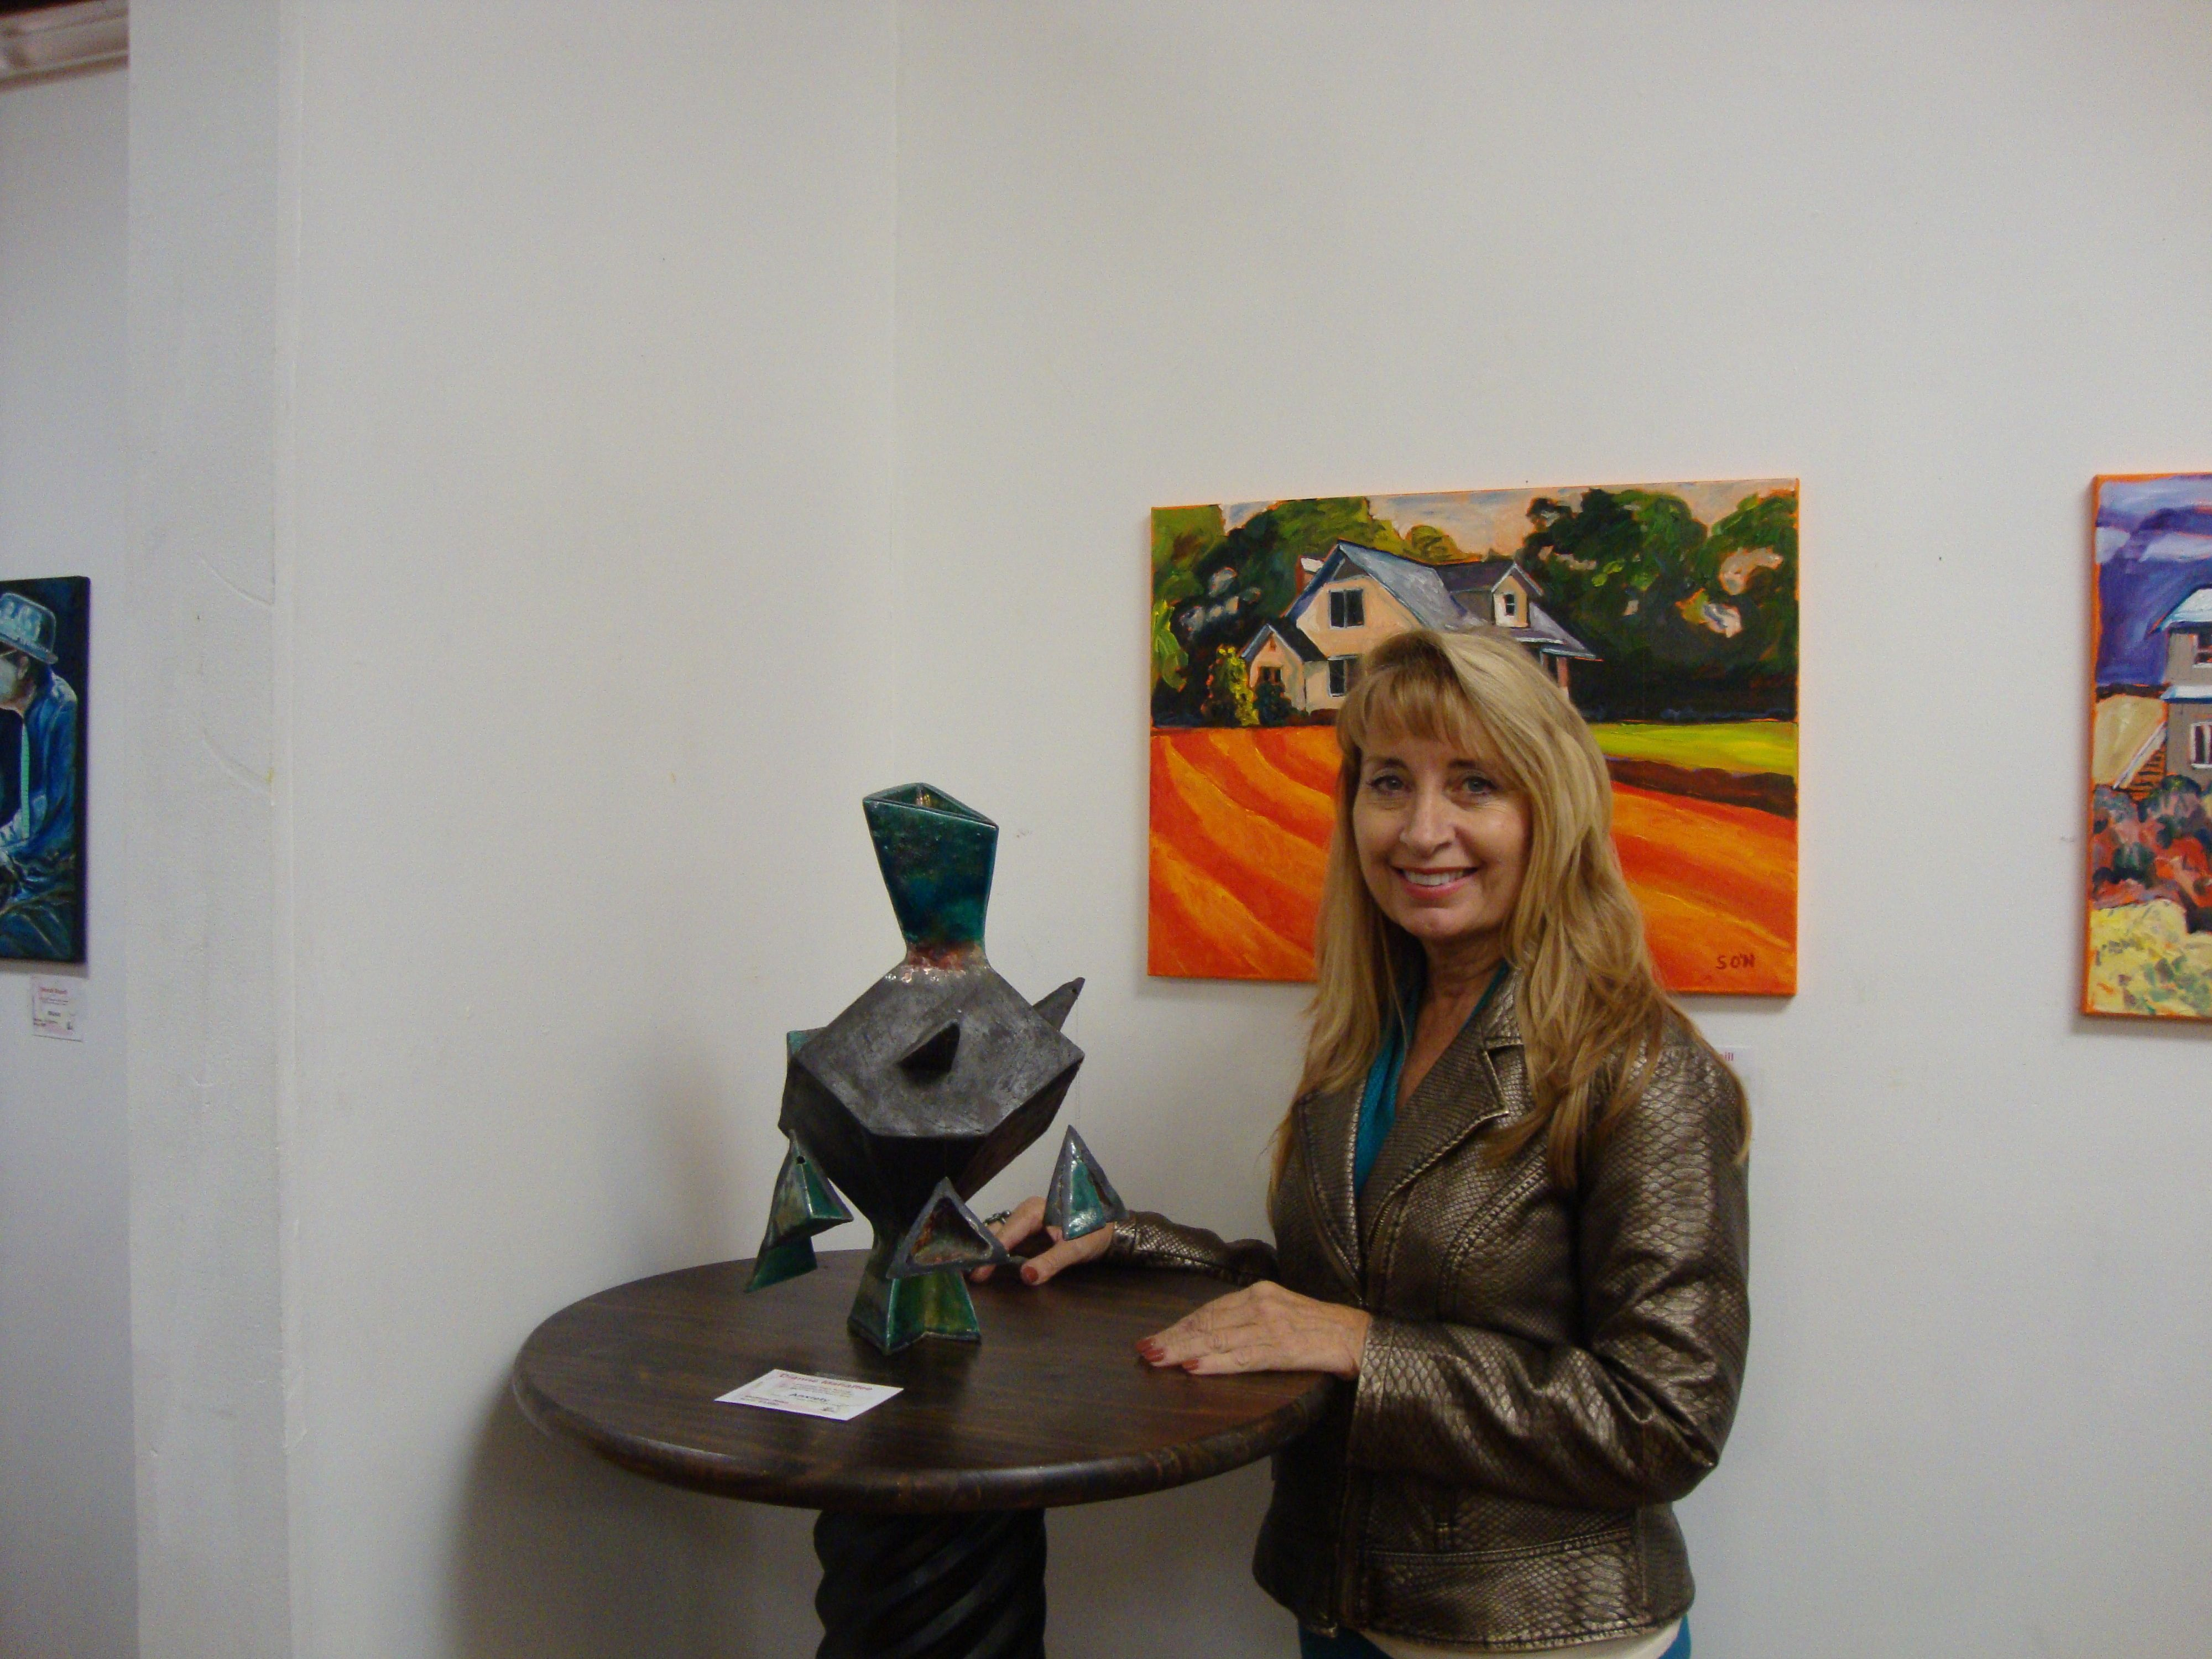 Dianne Mahaffee's Pottery Studio open for Ag+Art Tour of Lancaster County June 27 & 28. www.agandarttour.com